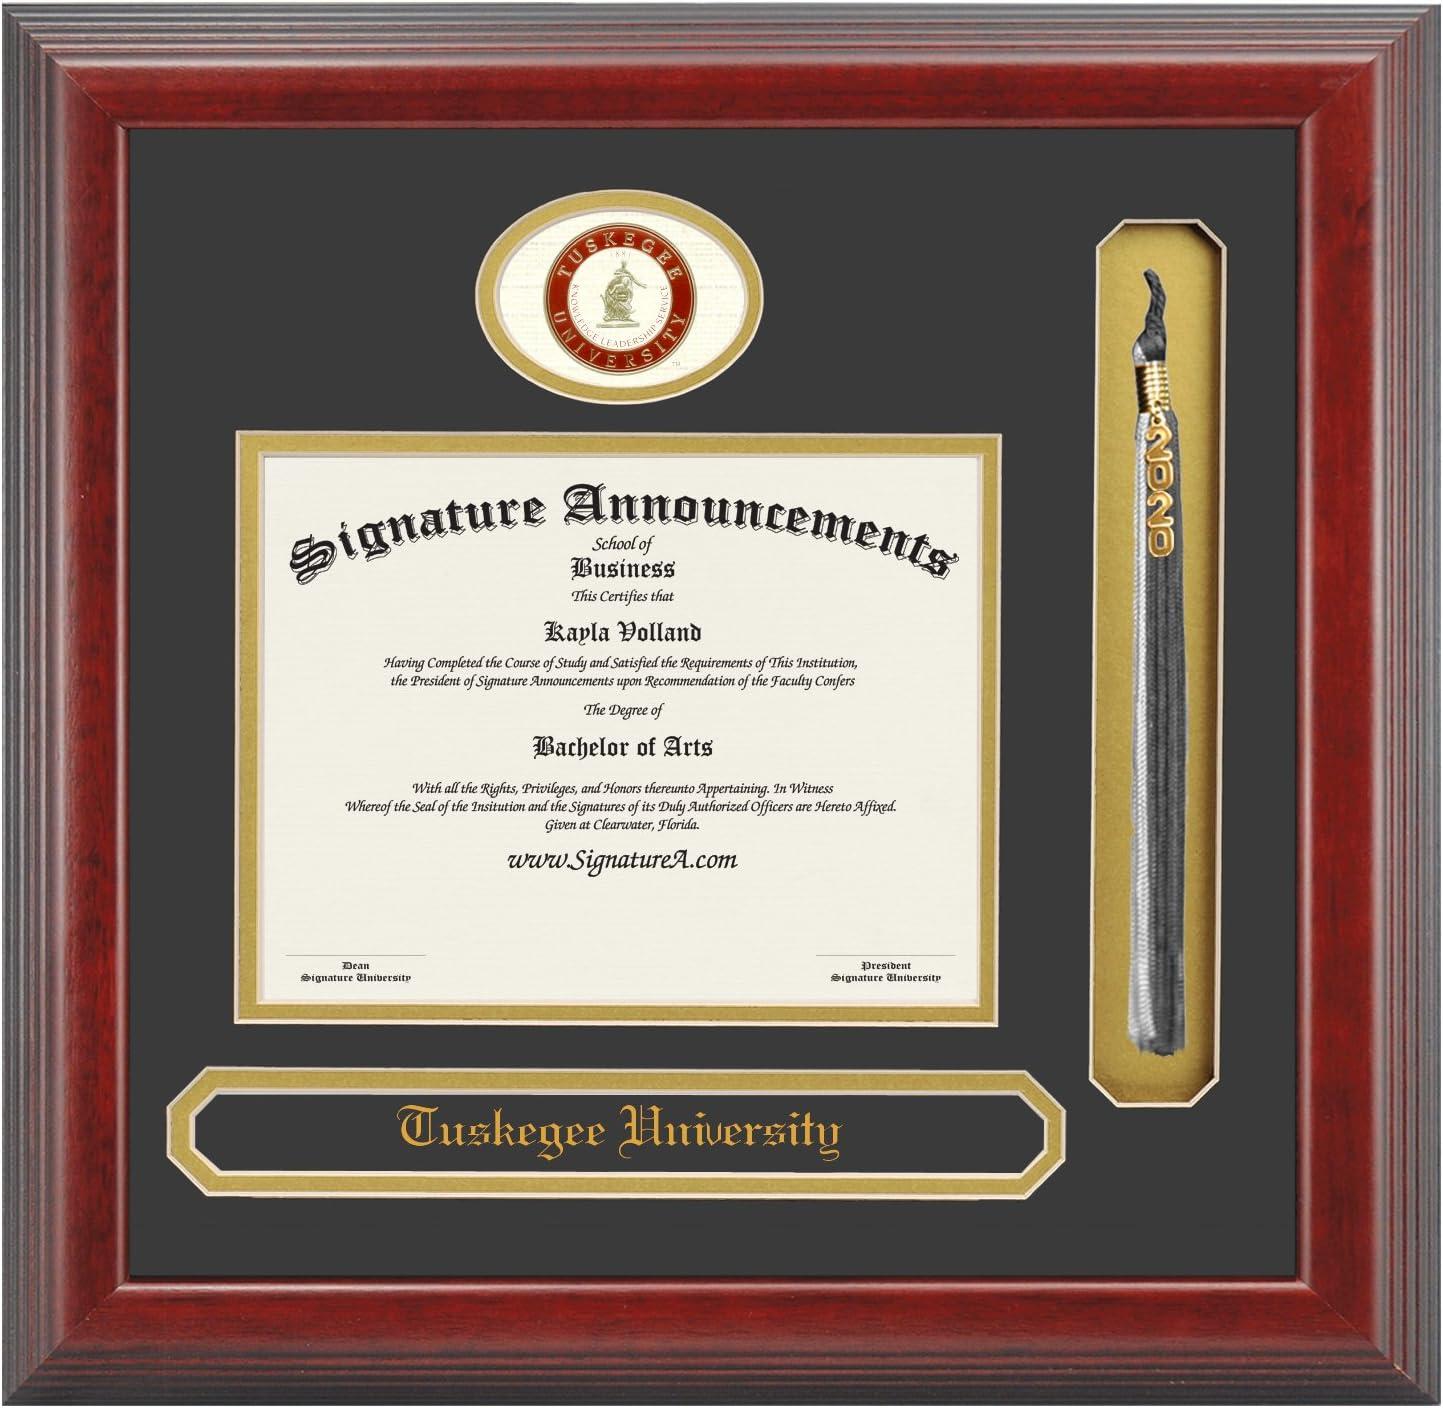 Signature Announcements University-of-Louisiana-at-Monroe Undergraduate Professional//Doctor Sculpted Foil Seal Graduation Diploma Frame 16 x 16 Cherry